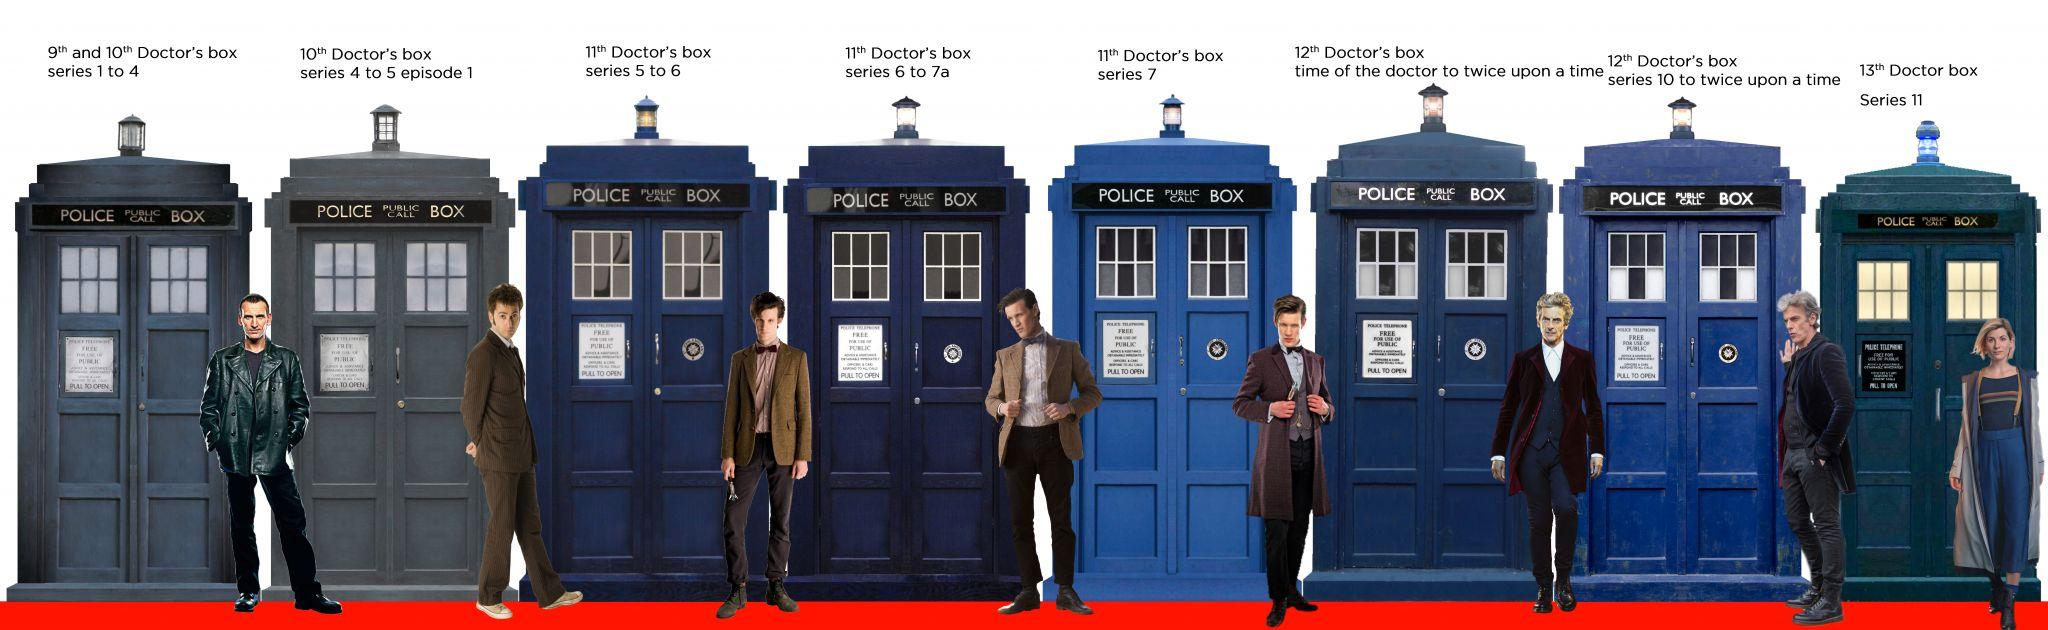 Modern TARDIS box line up .jpg